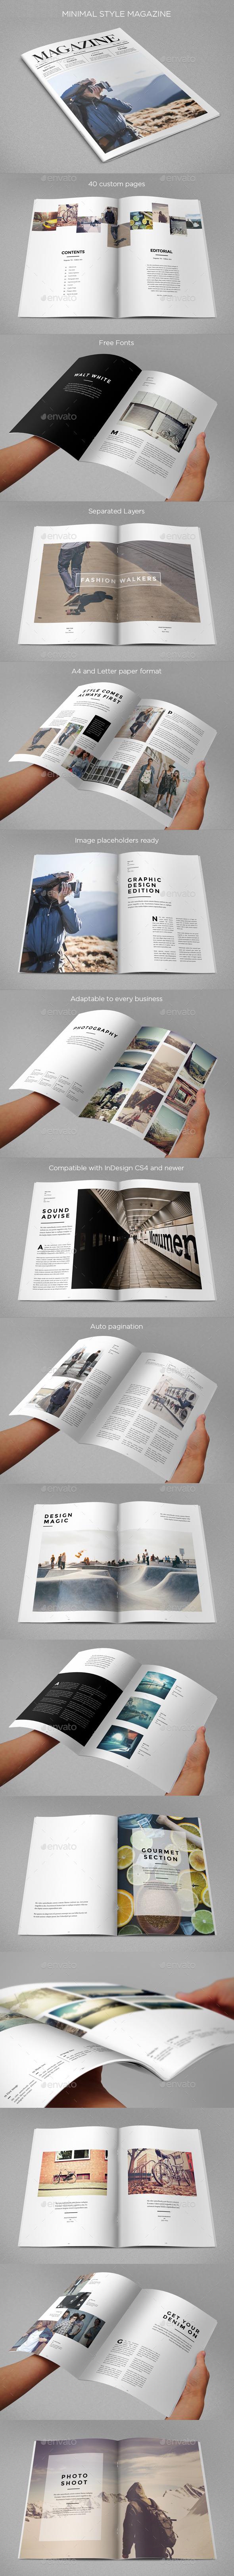 Minimal Style Magazine - Magazines Print Templates